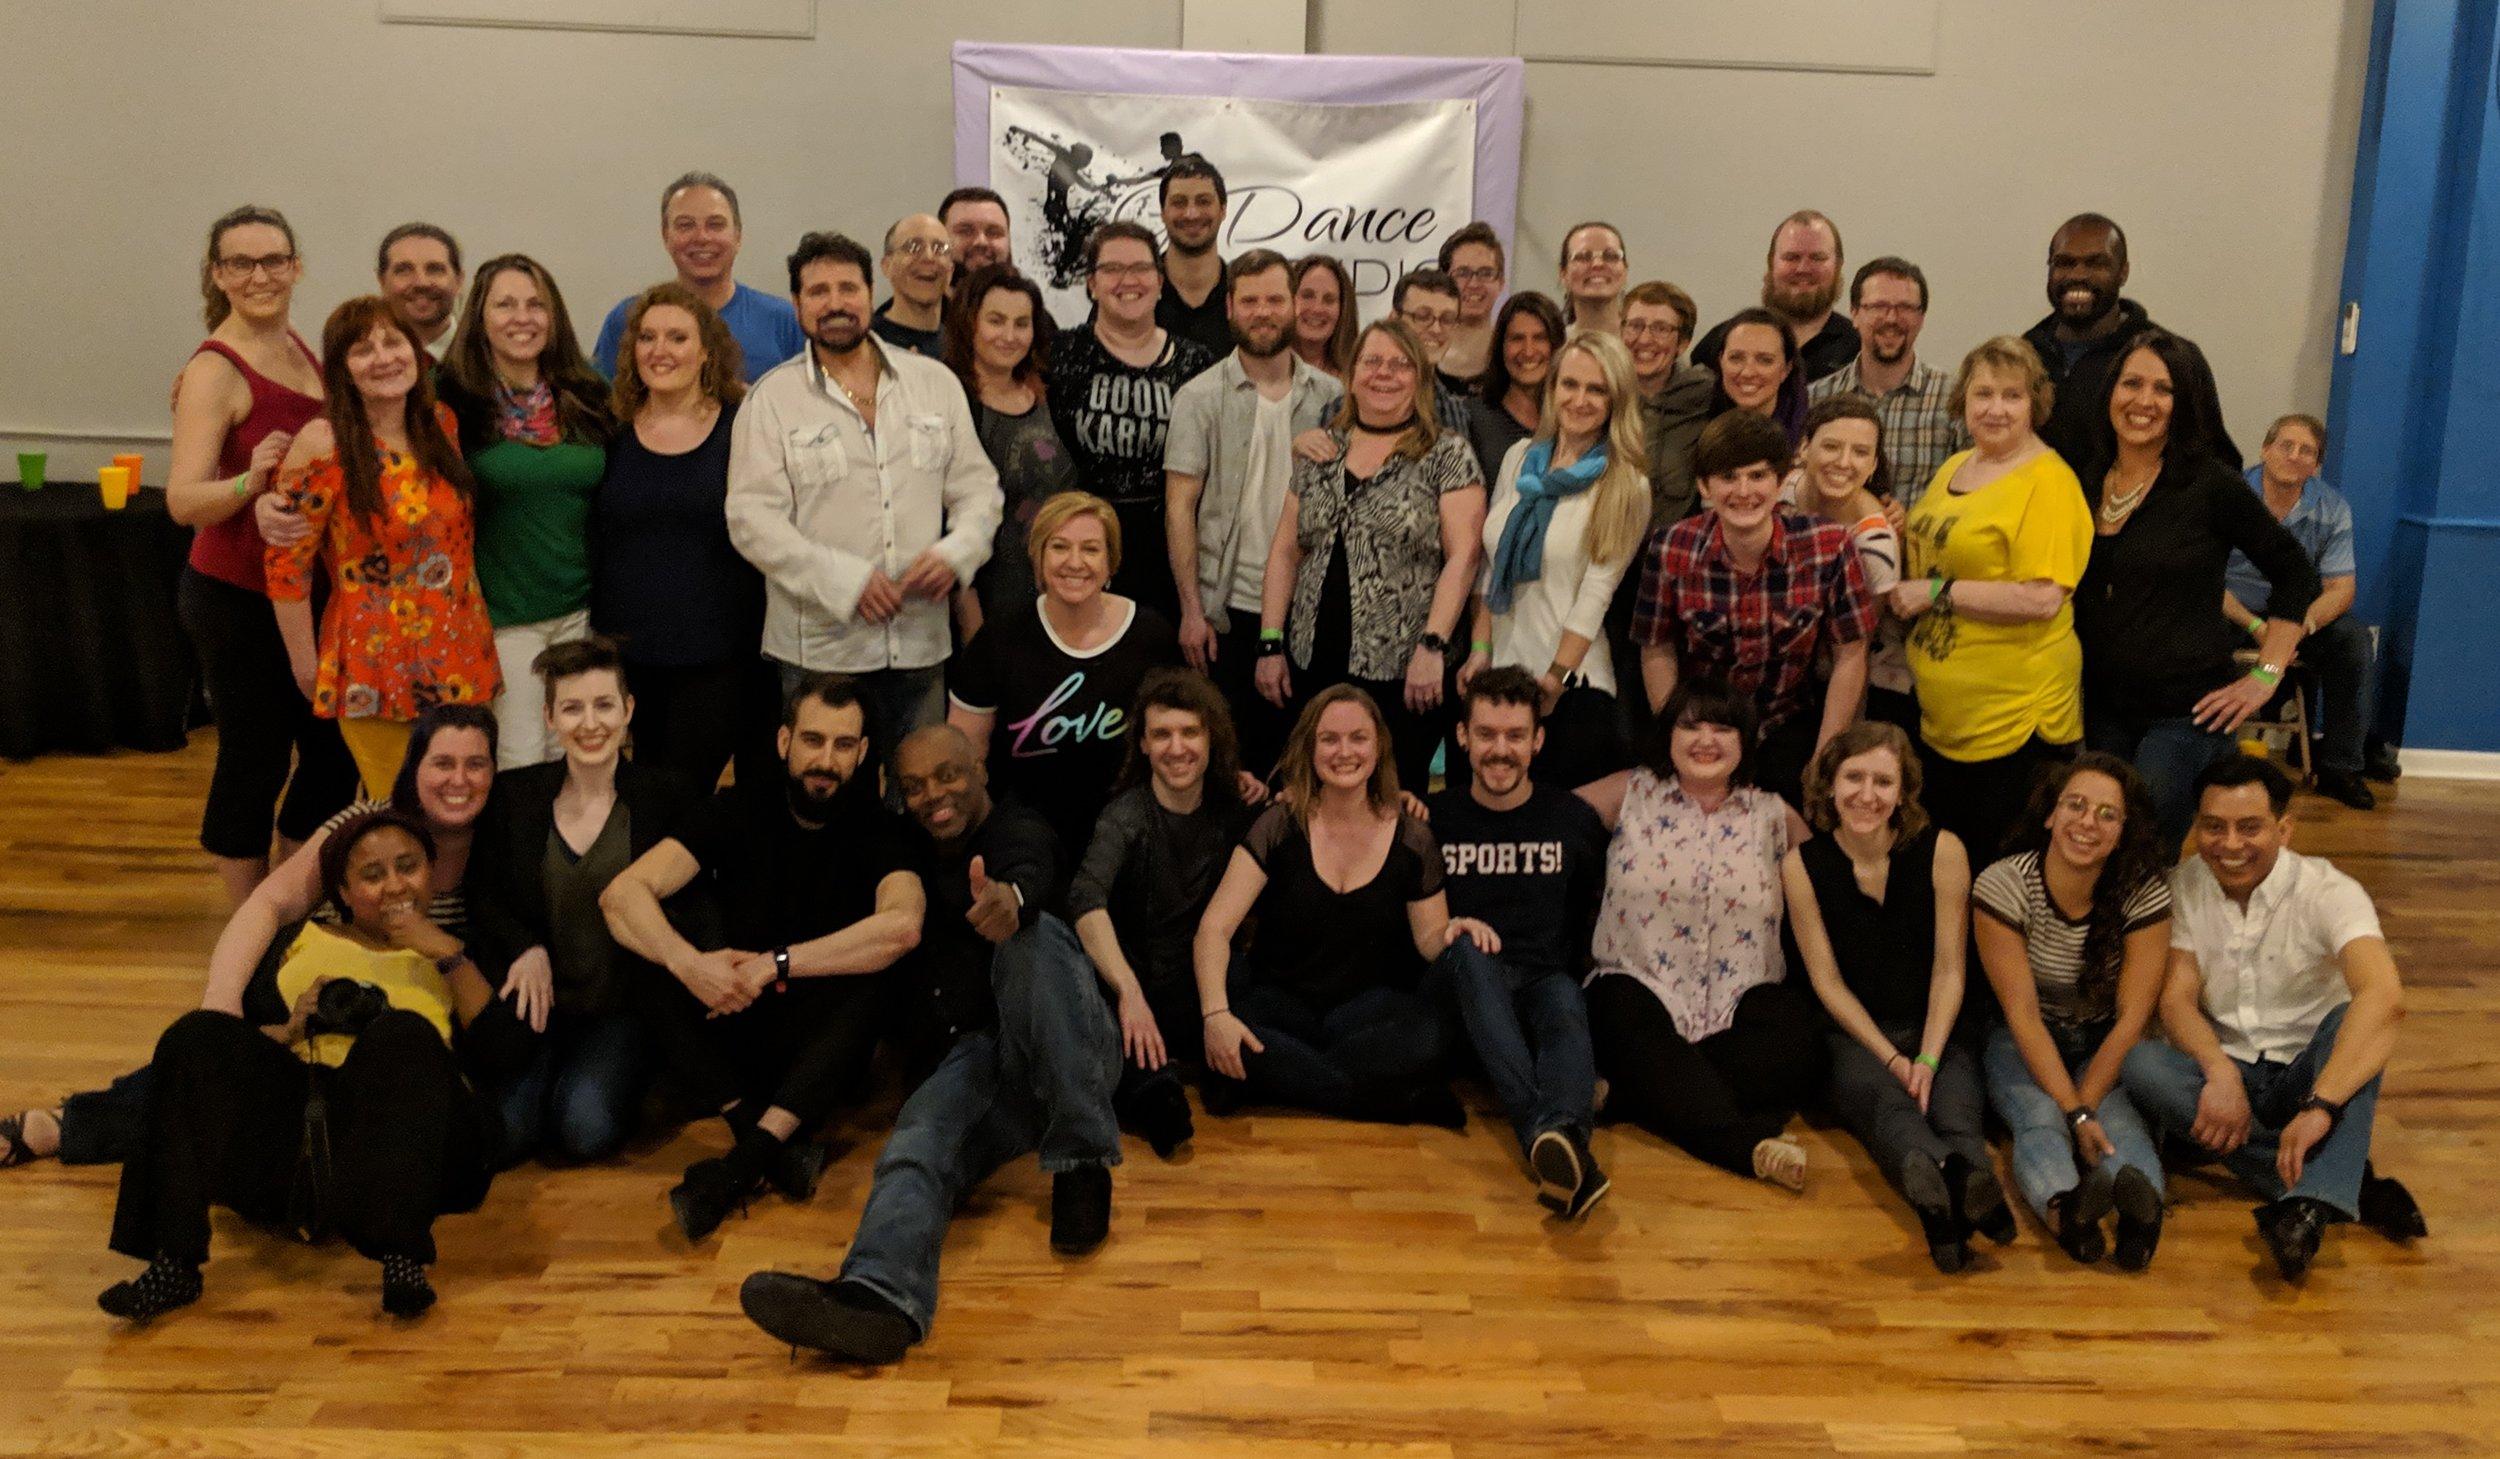 Our 2019 Westie Spring Fling Crew